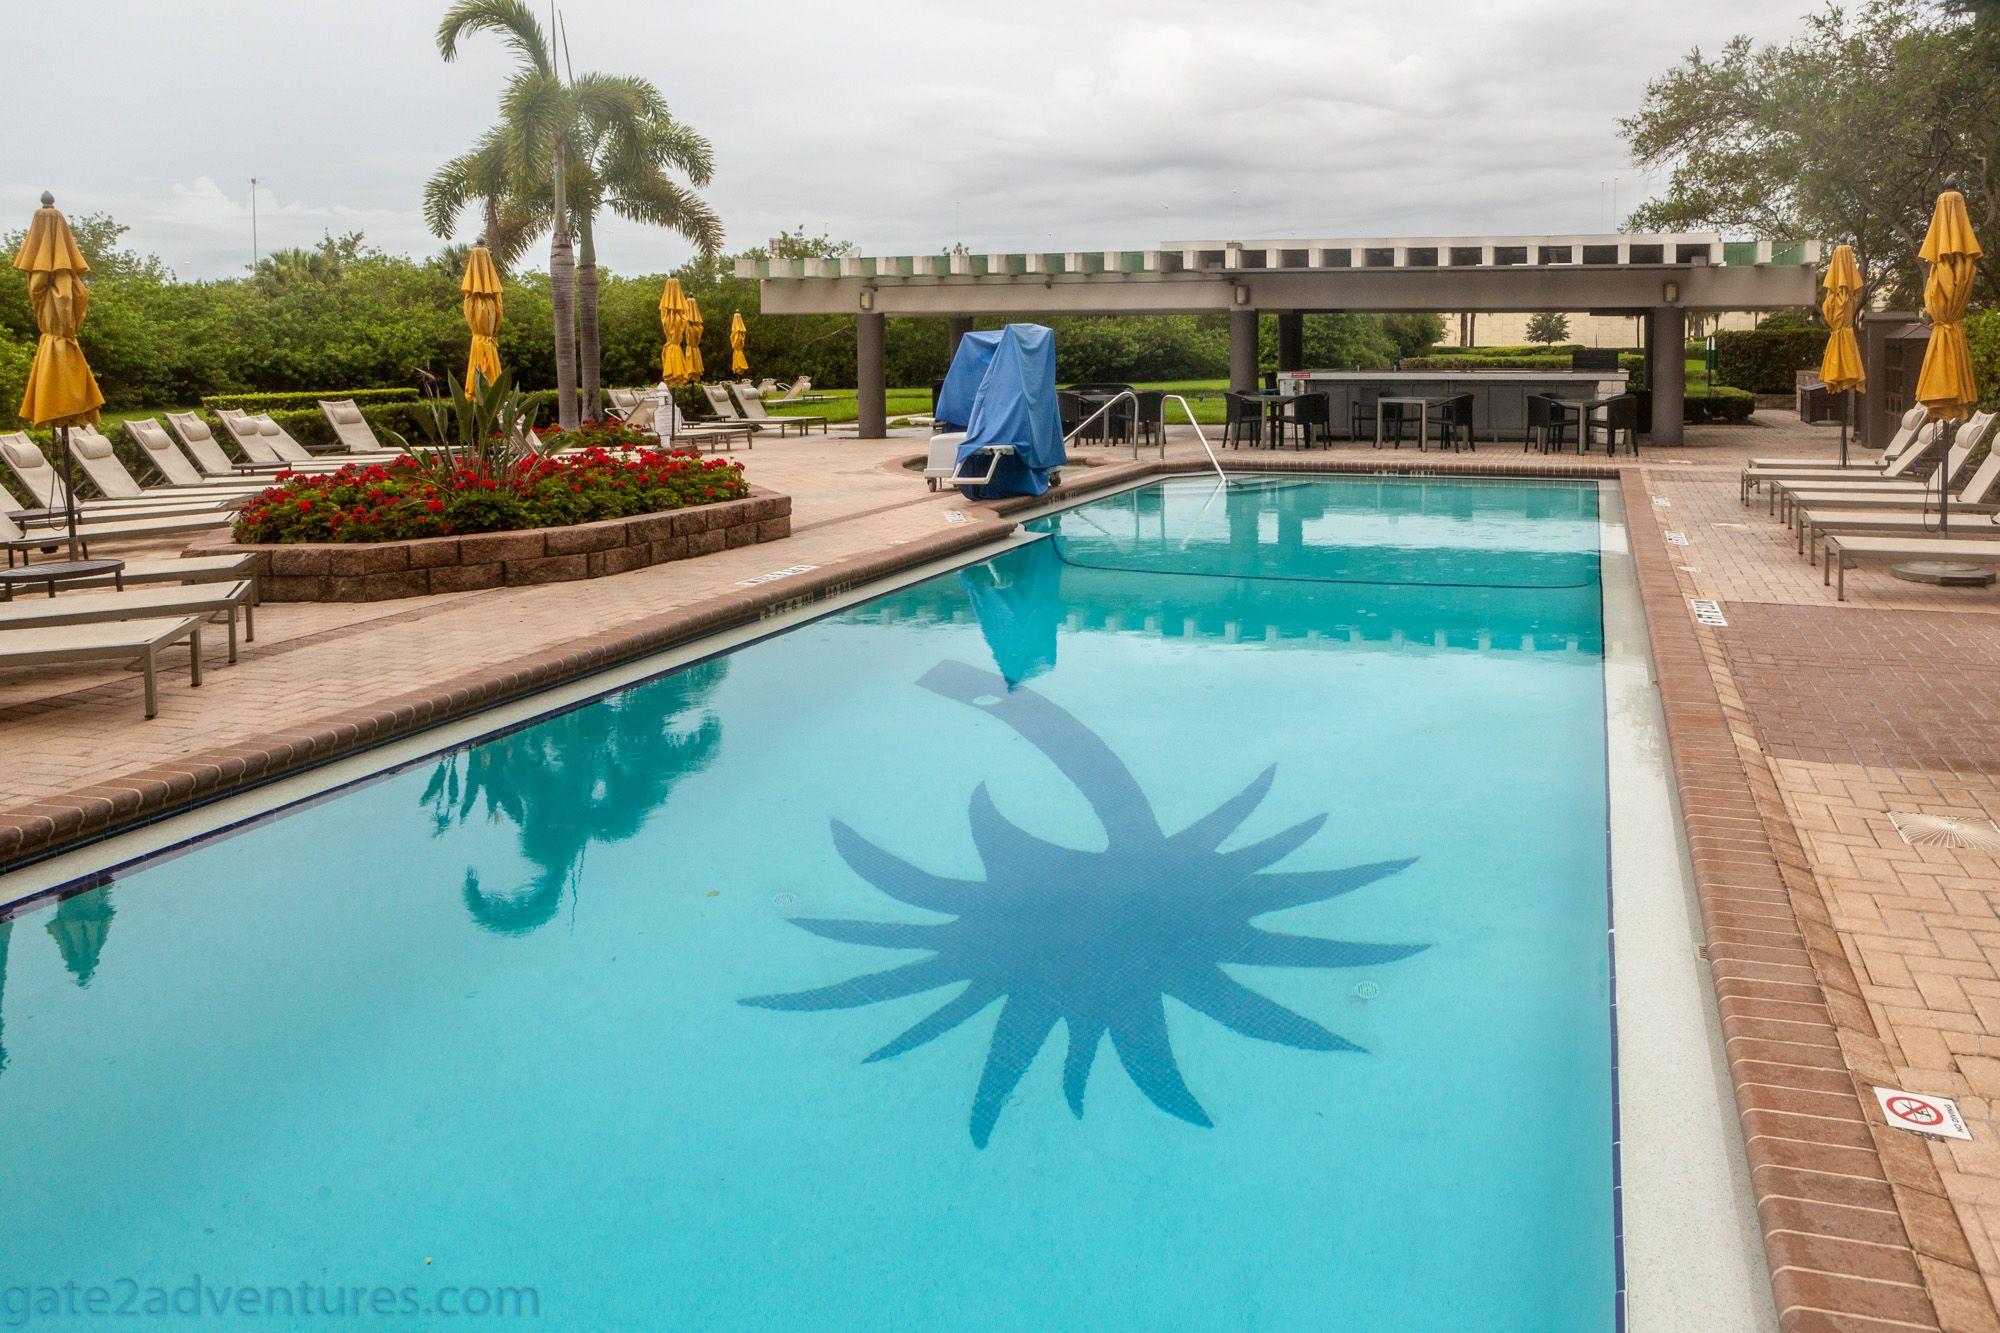 Silvercar Los Angeles >> Grand Hyatt Tampa Bay - Gate to Adventures